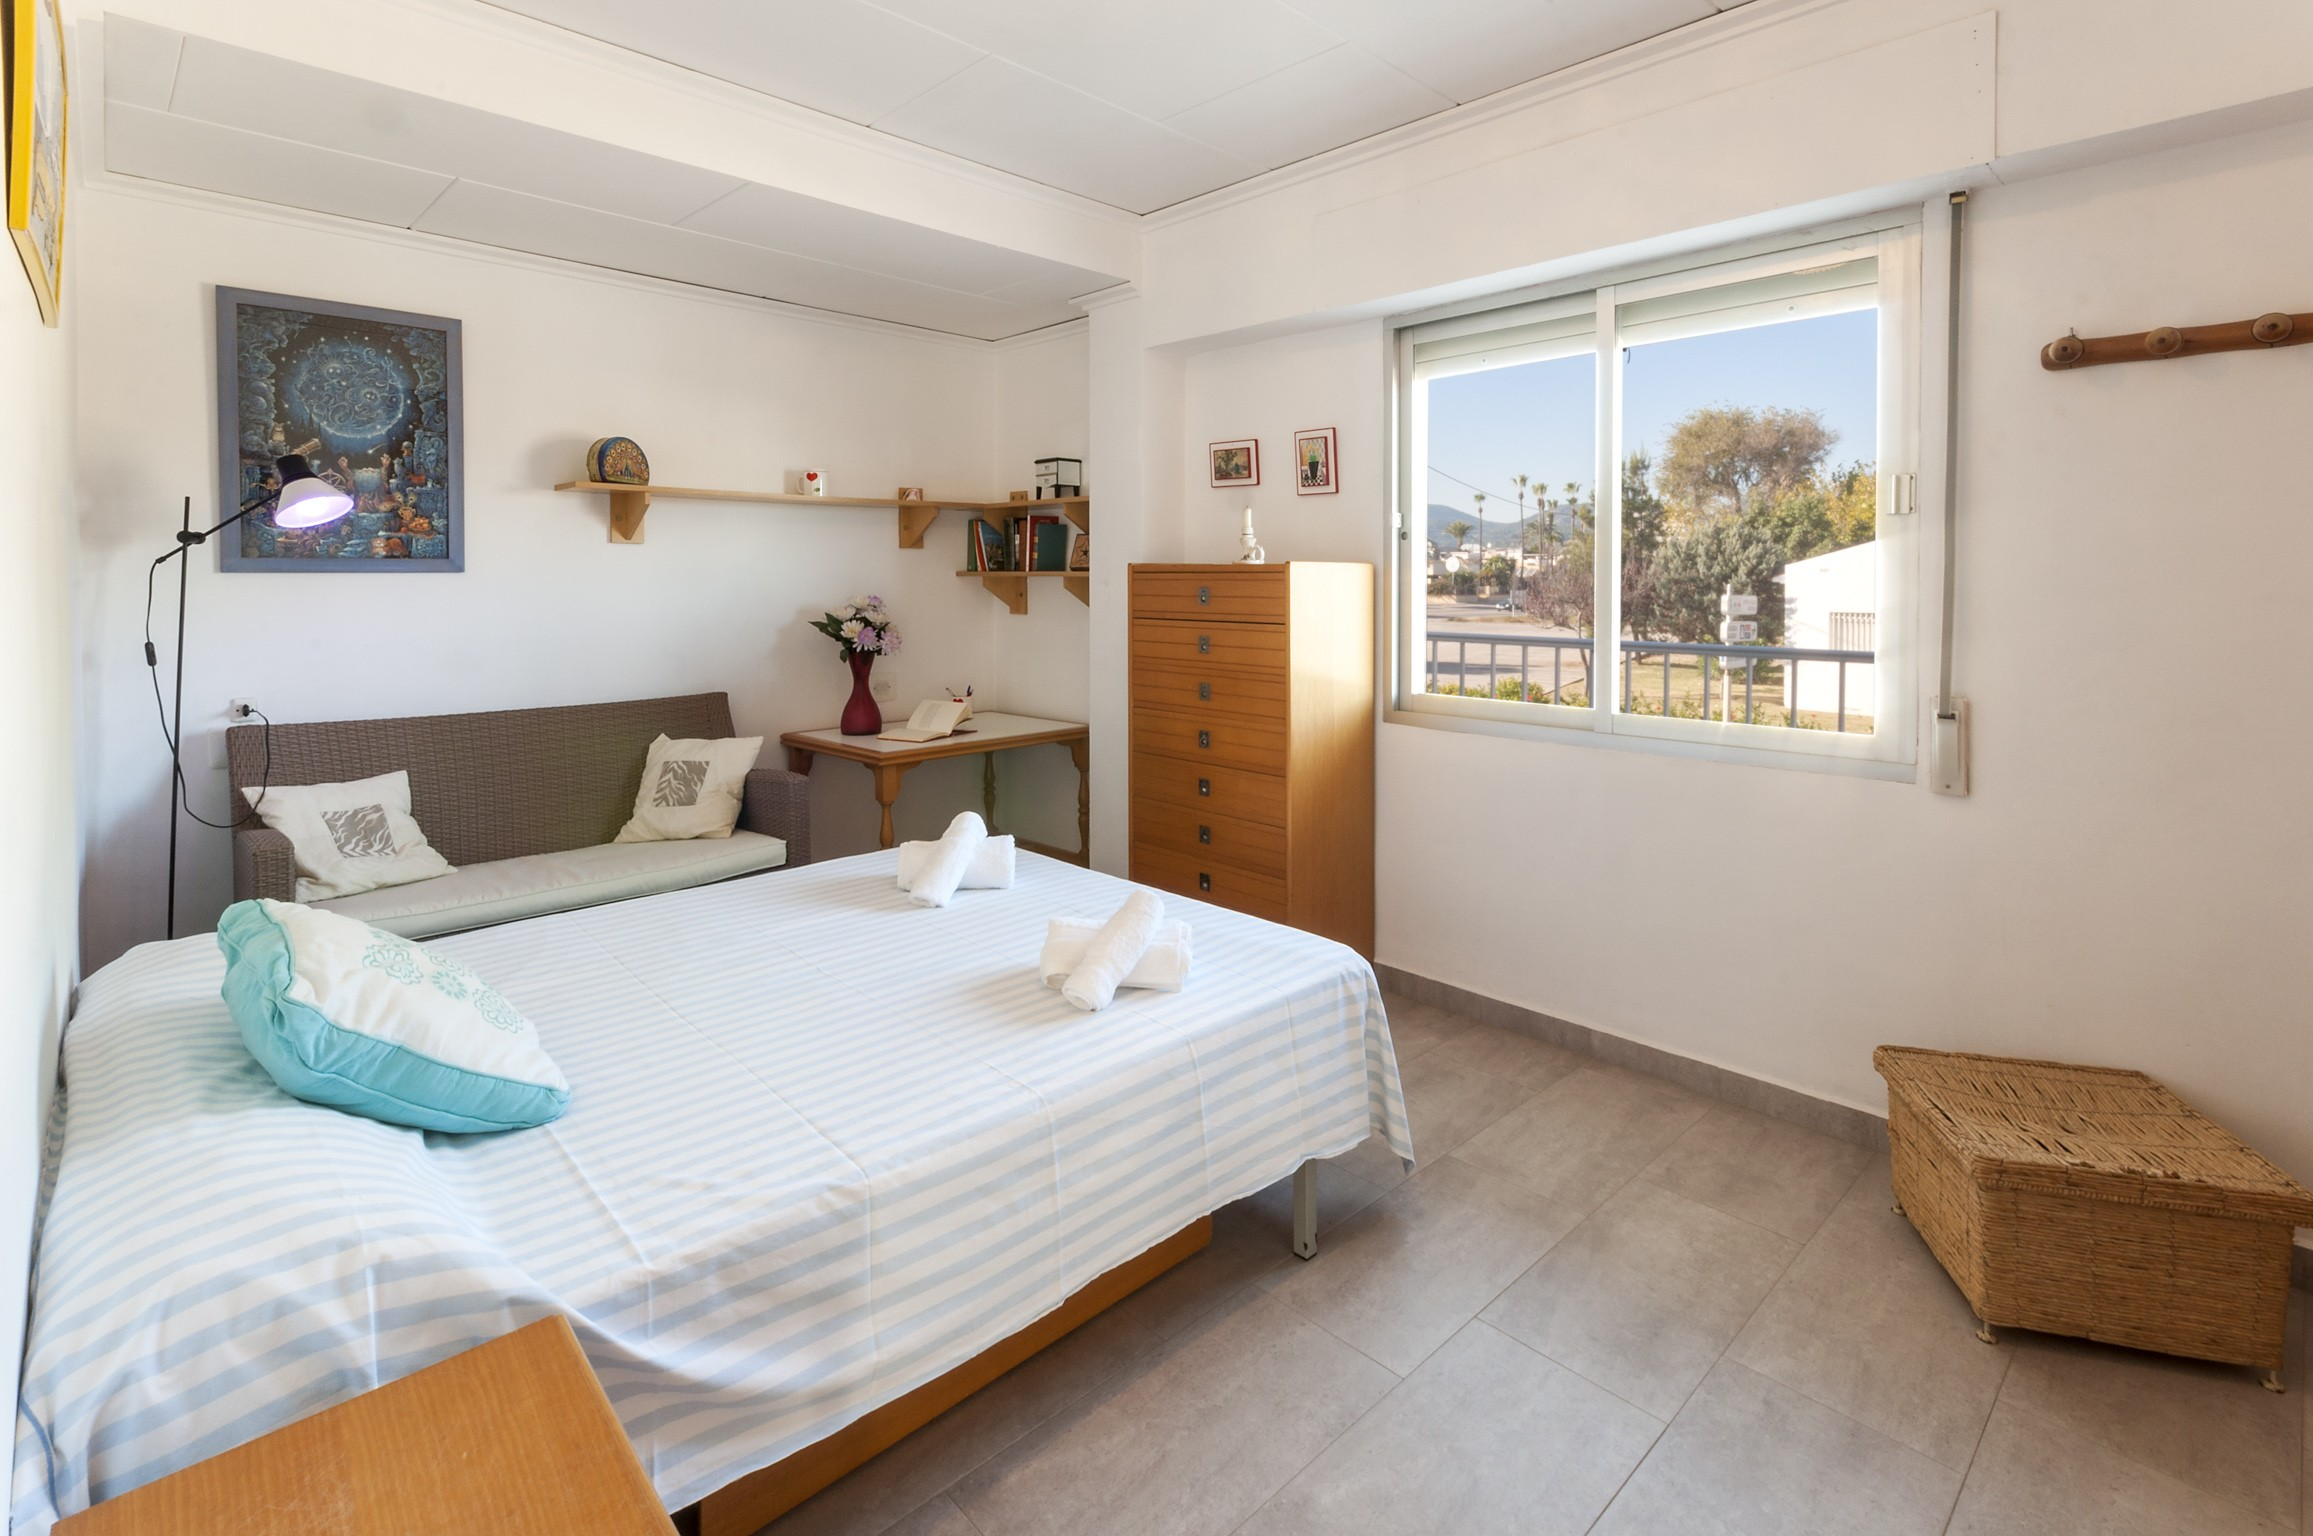 Ferienwohnung COTTON (2326755), Playa de Oliva, Costa de Valencia, Valencia, Spanien, Bild 9